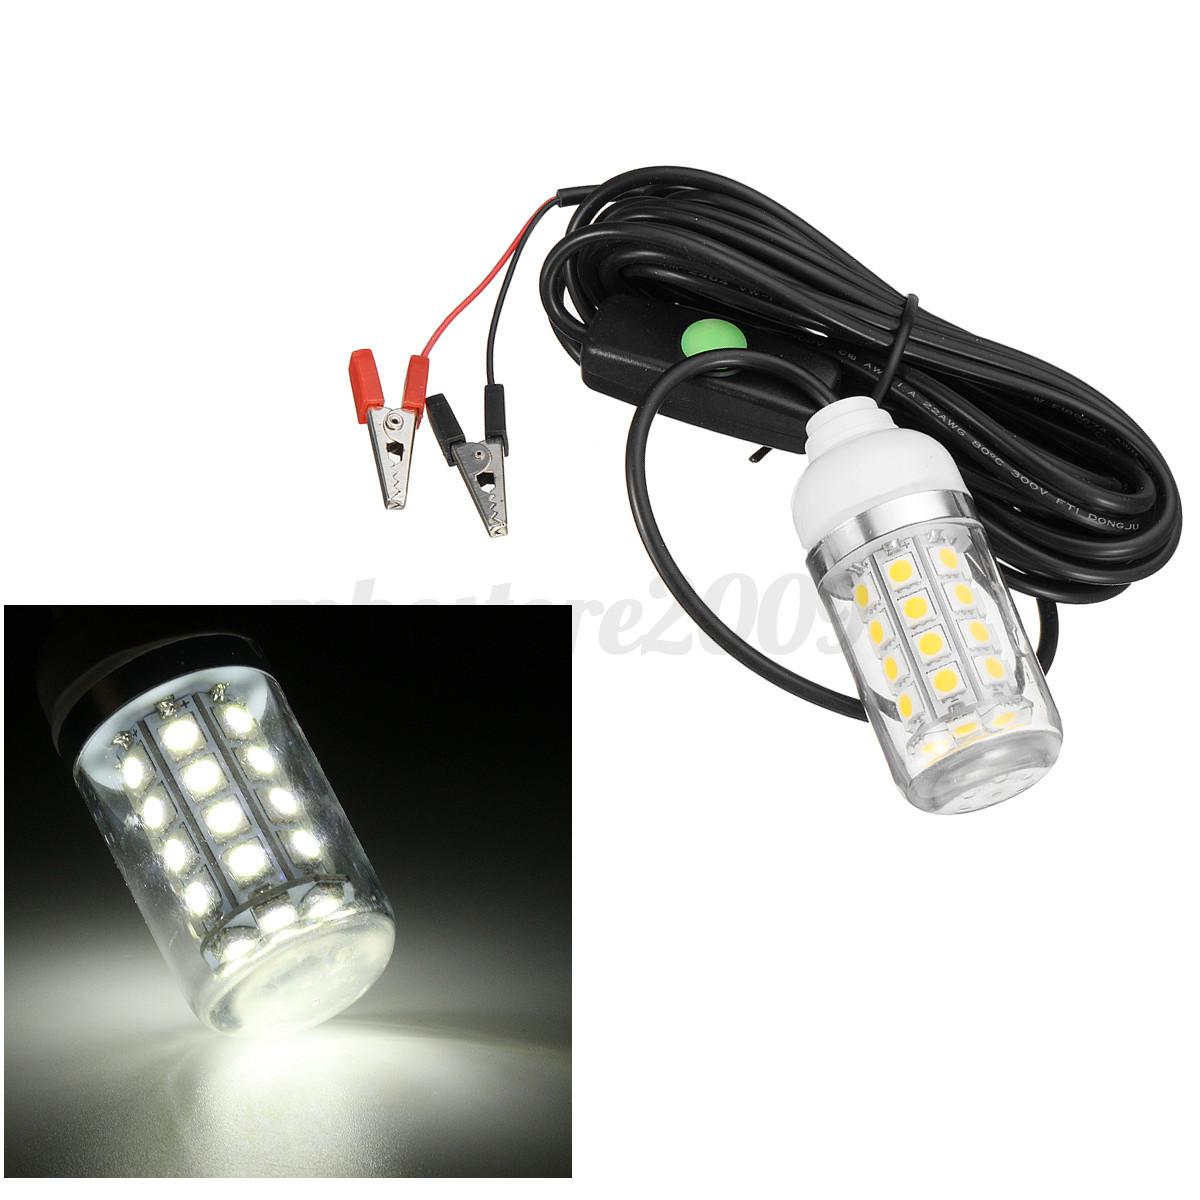 12v 36 led underwater submersible night fishing light shad for Underwater led fishing lights